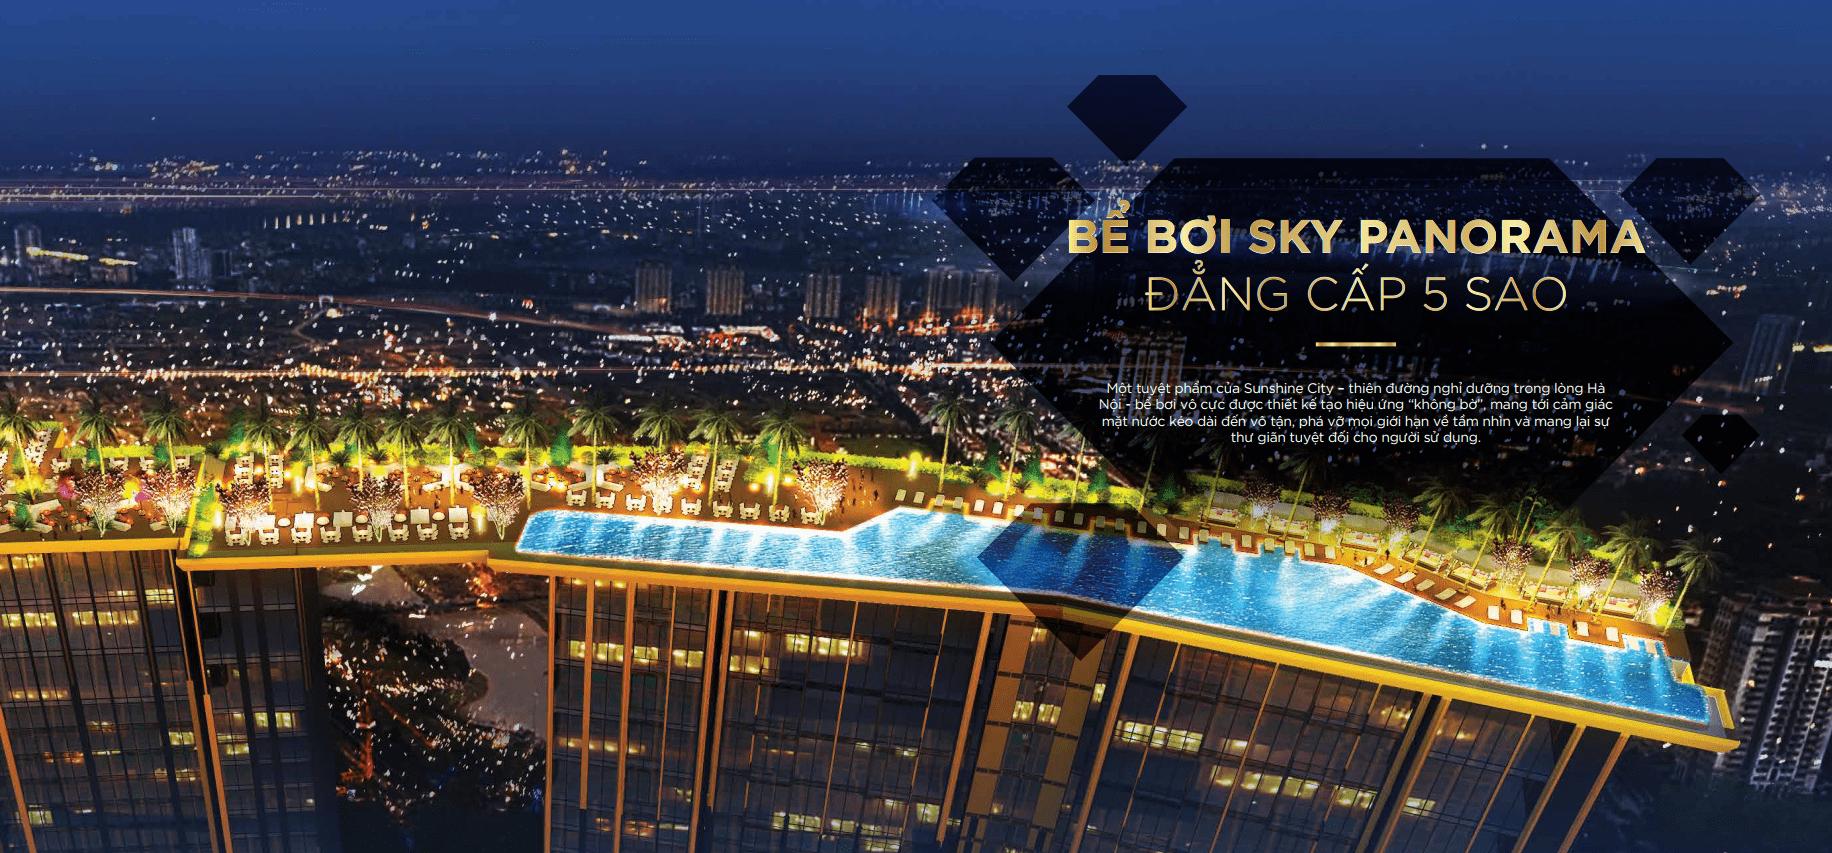 Bể bơi Sky Panorama 5 Sao chung cư sunshine city ciputra